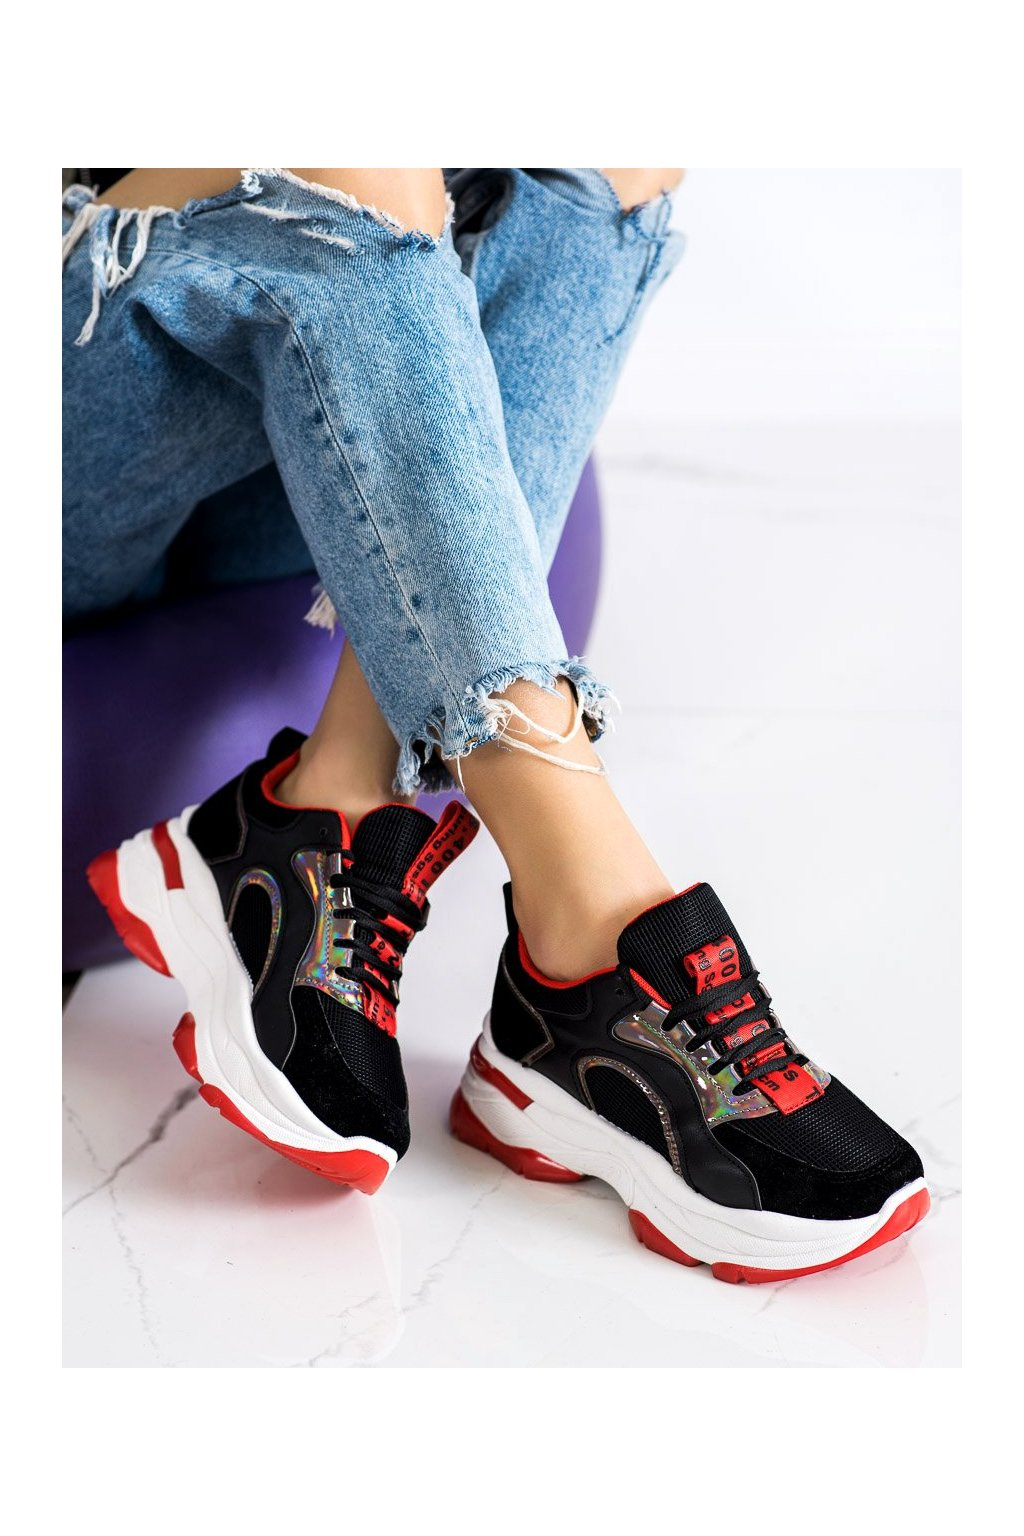 Čierne tenisky Fashion kod R12D518-11B/R